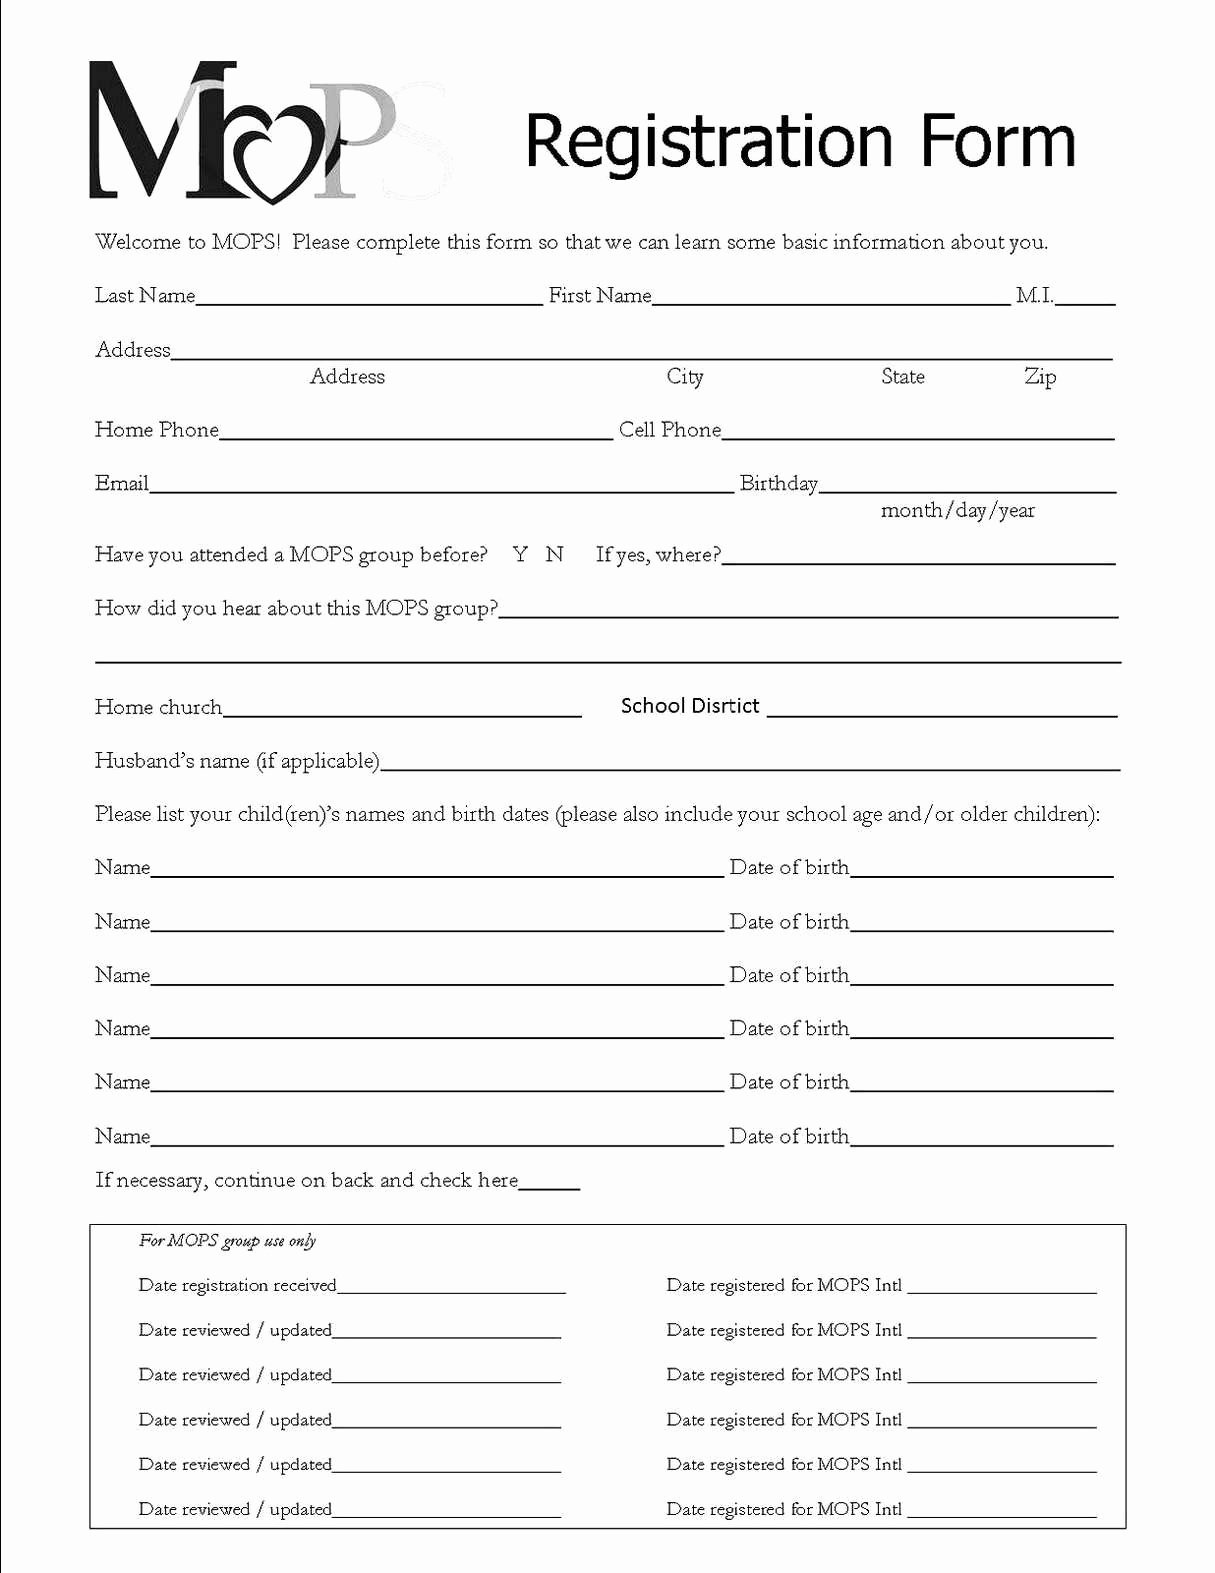 Registration form Template Free Download Lovely Registration forms Template Free